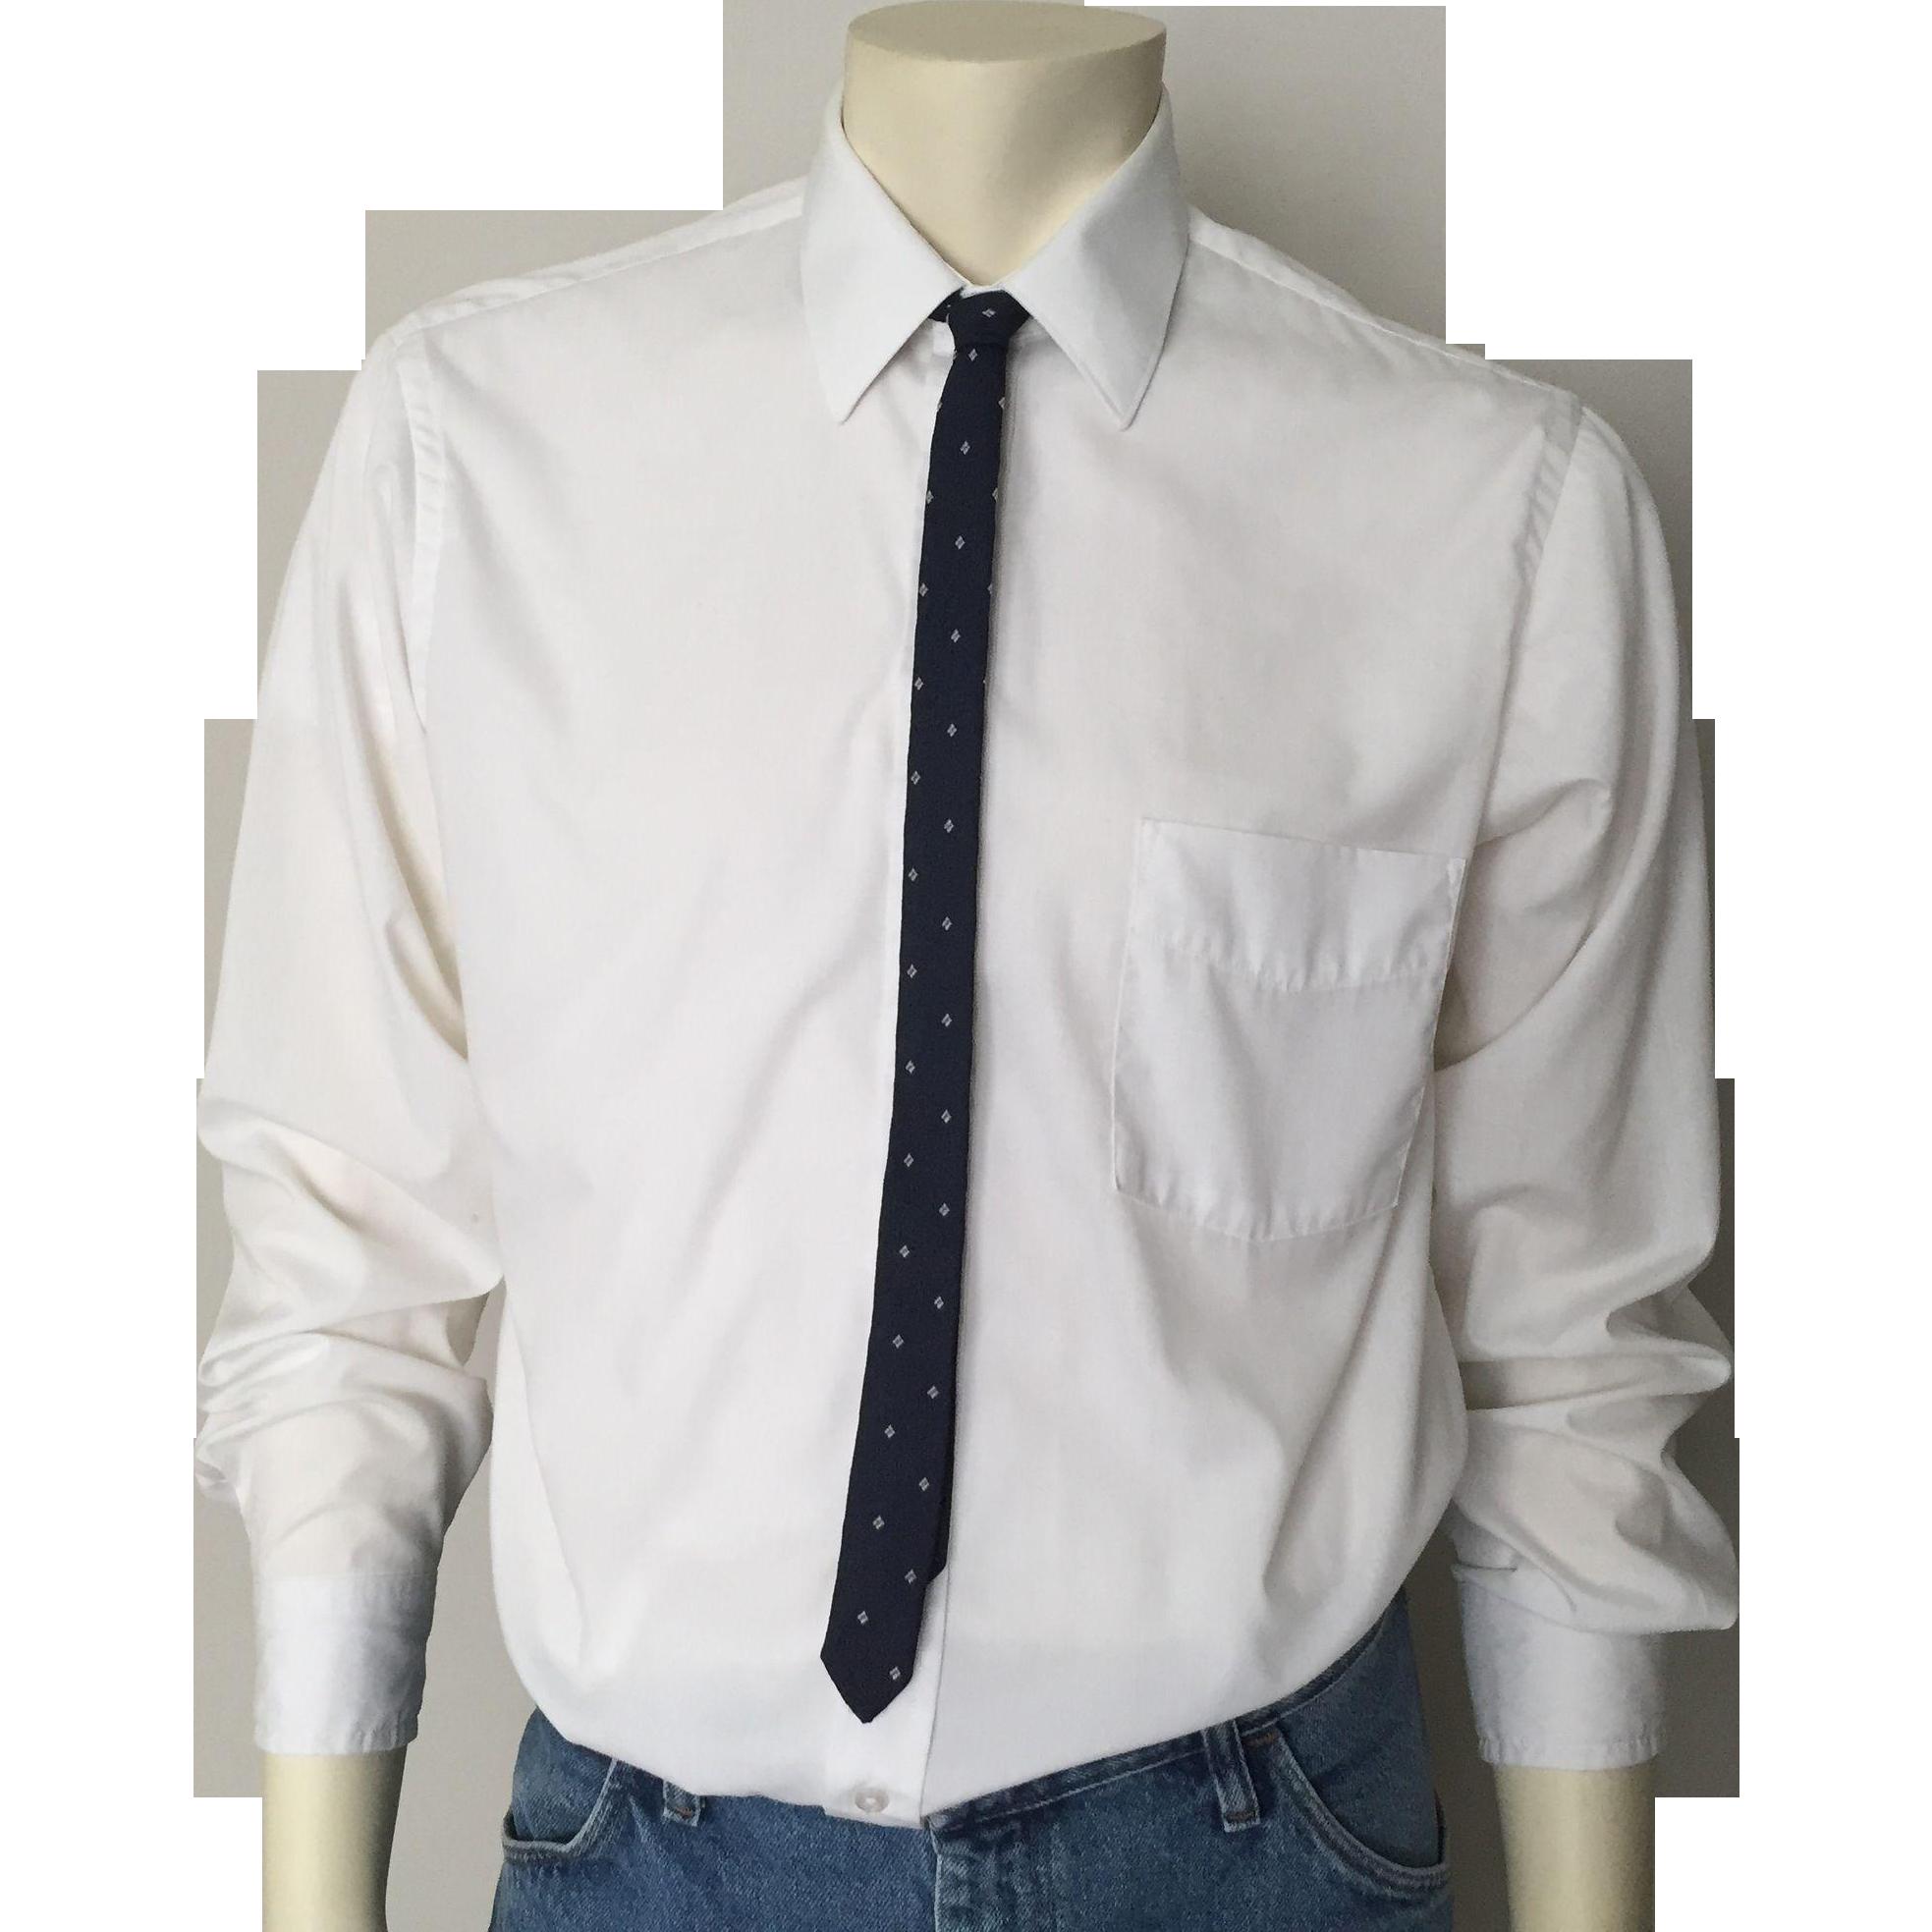 Vintage 1960s Skinny Navy Blue Jacquard Necktie with Tiny Cream Harlequin Diamond Shaped Details